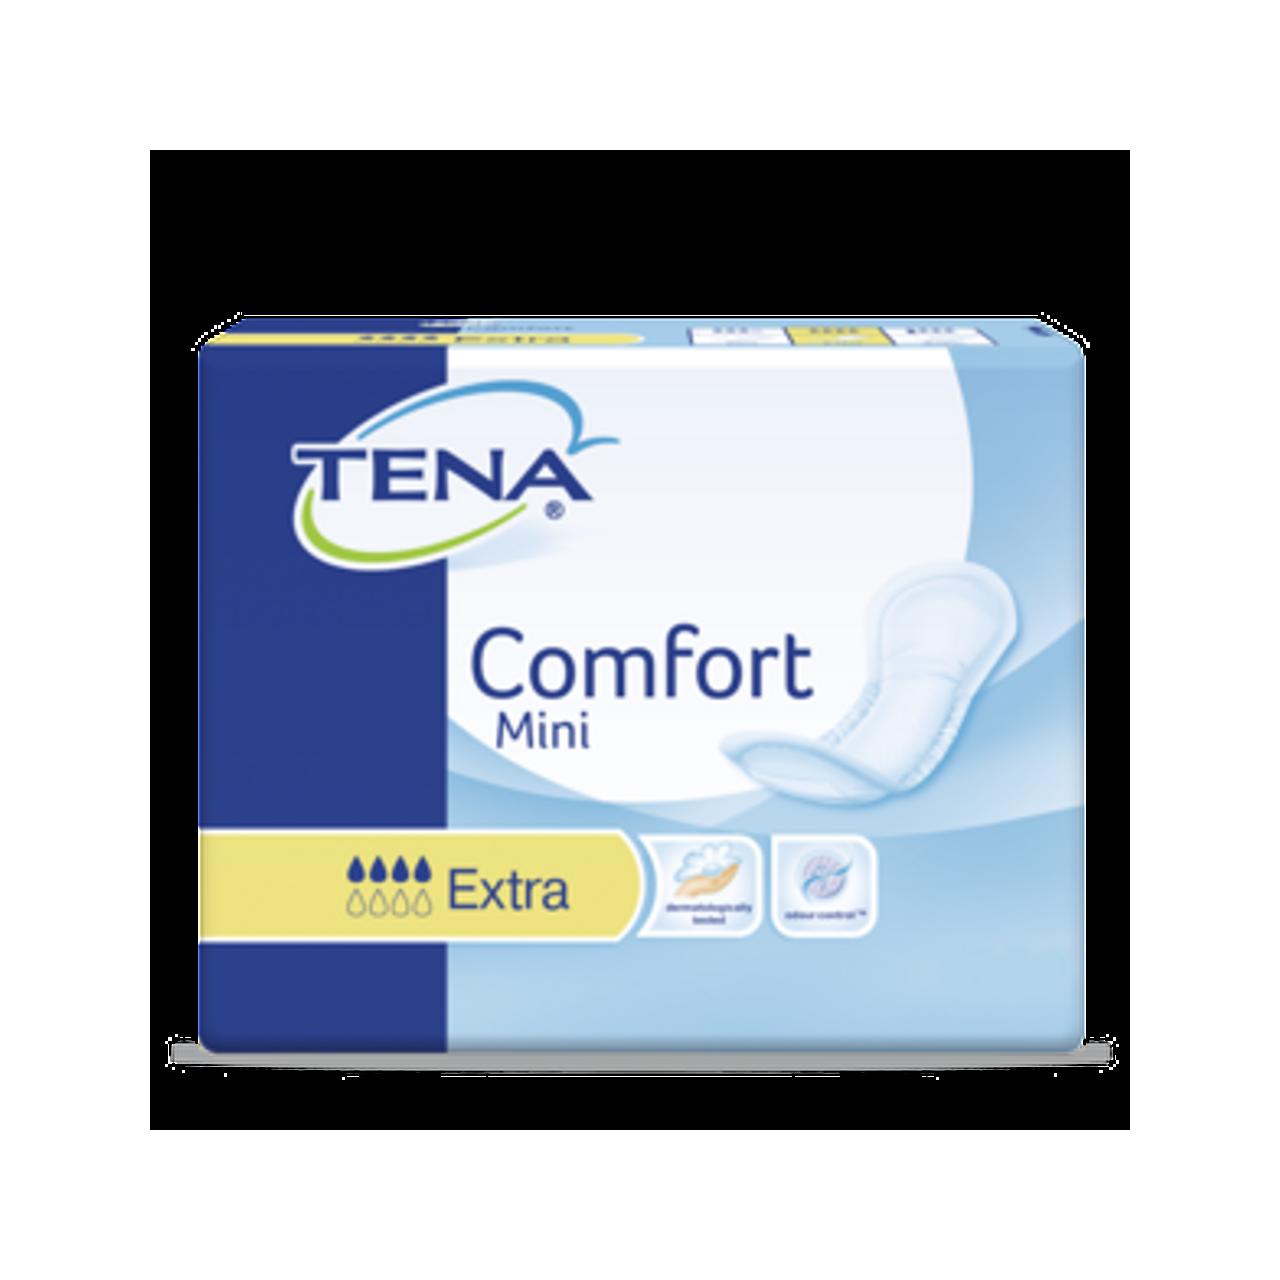 TENA Comfortmini